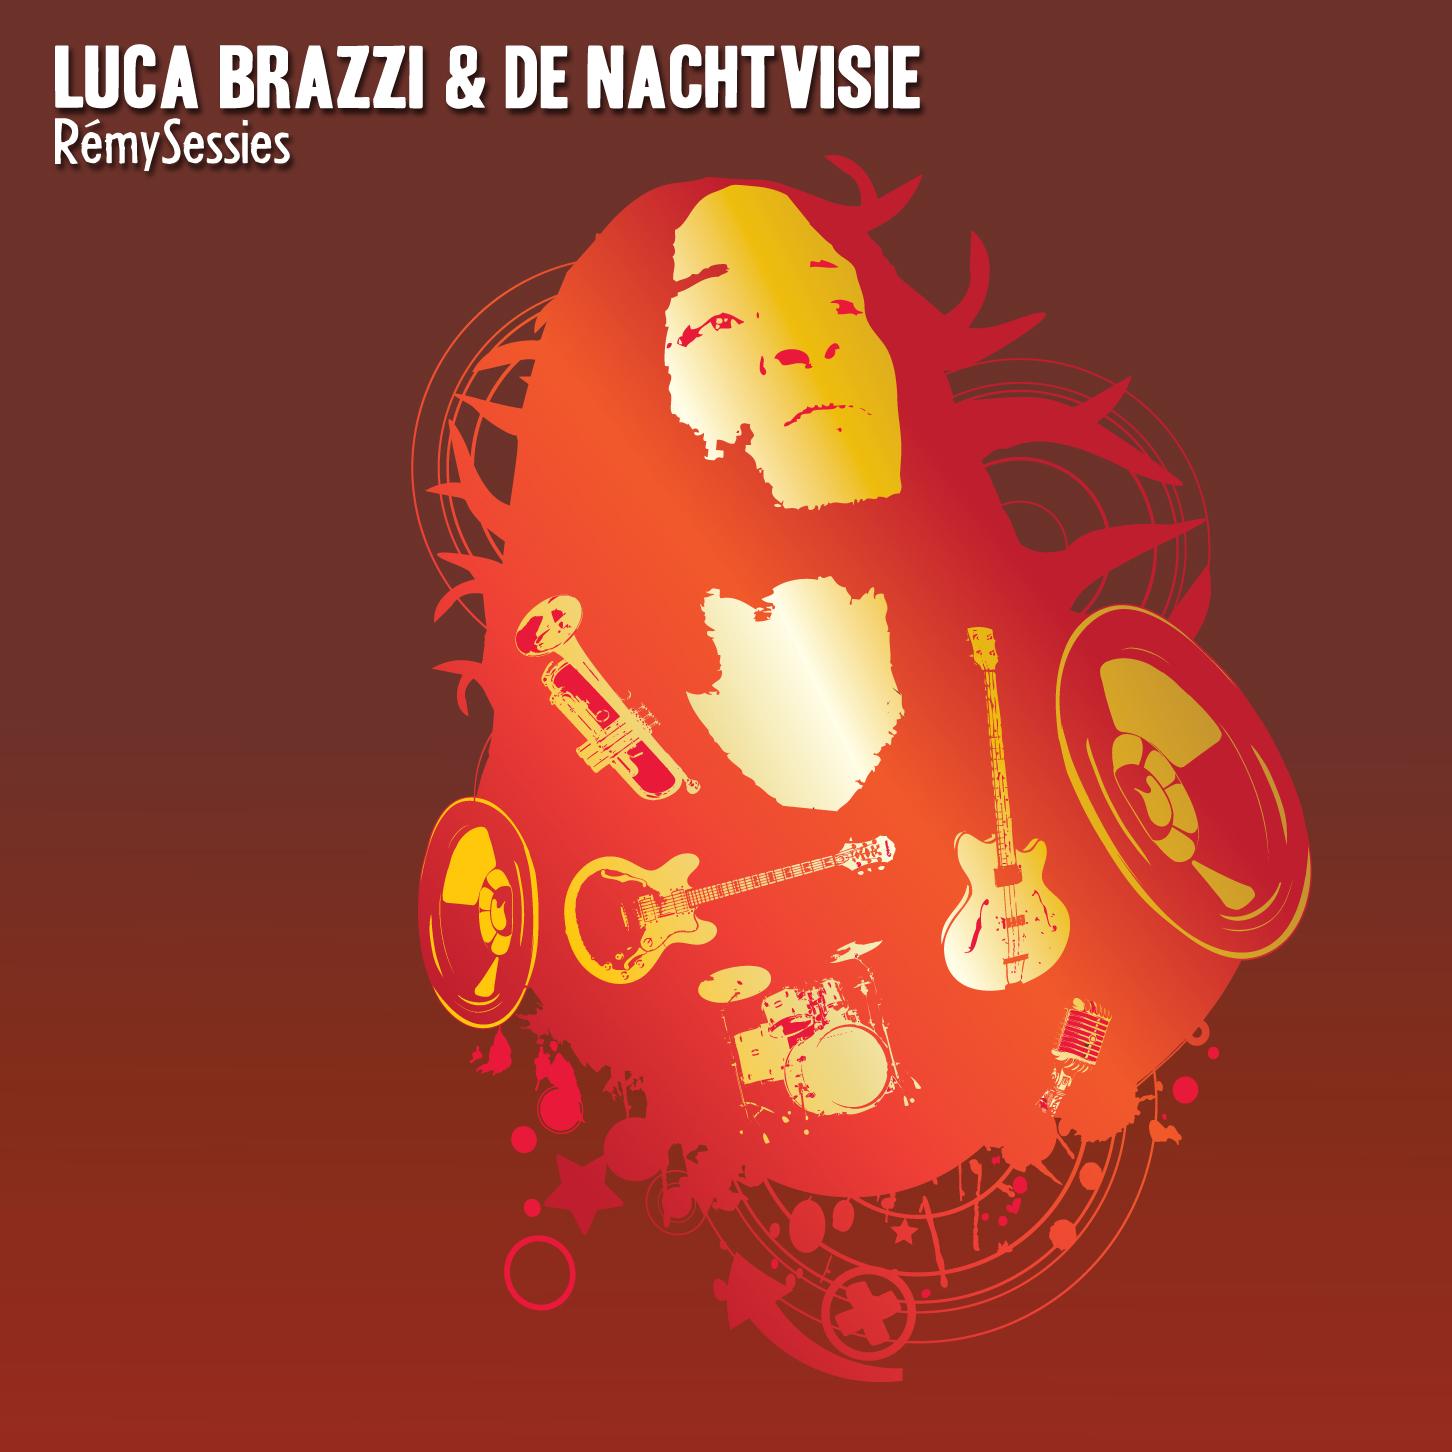 Luca Brazzi & De Nachtvisie